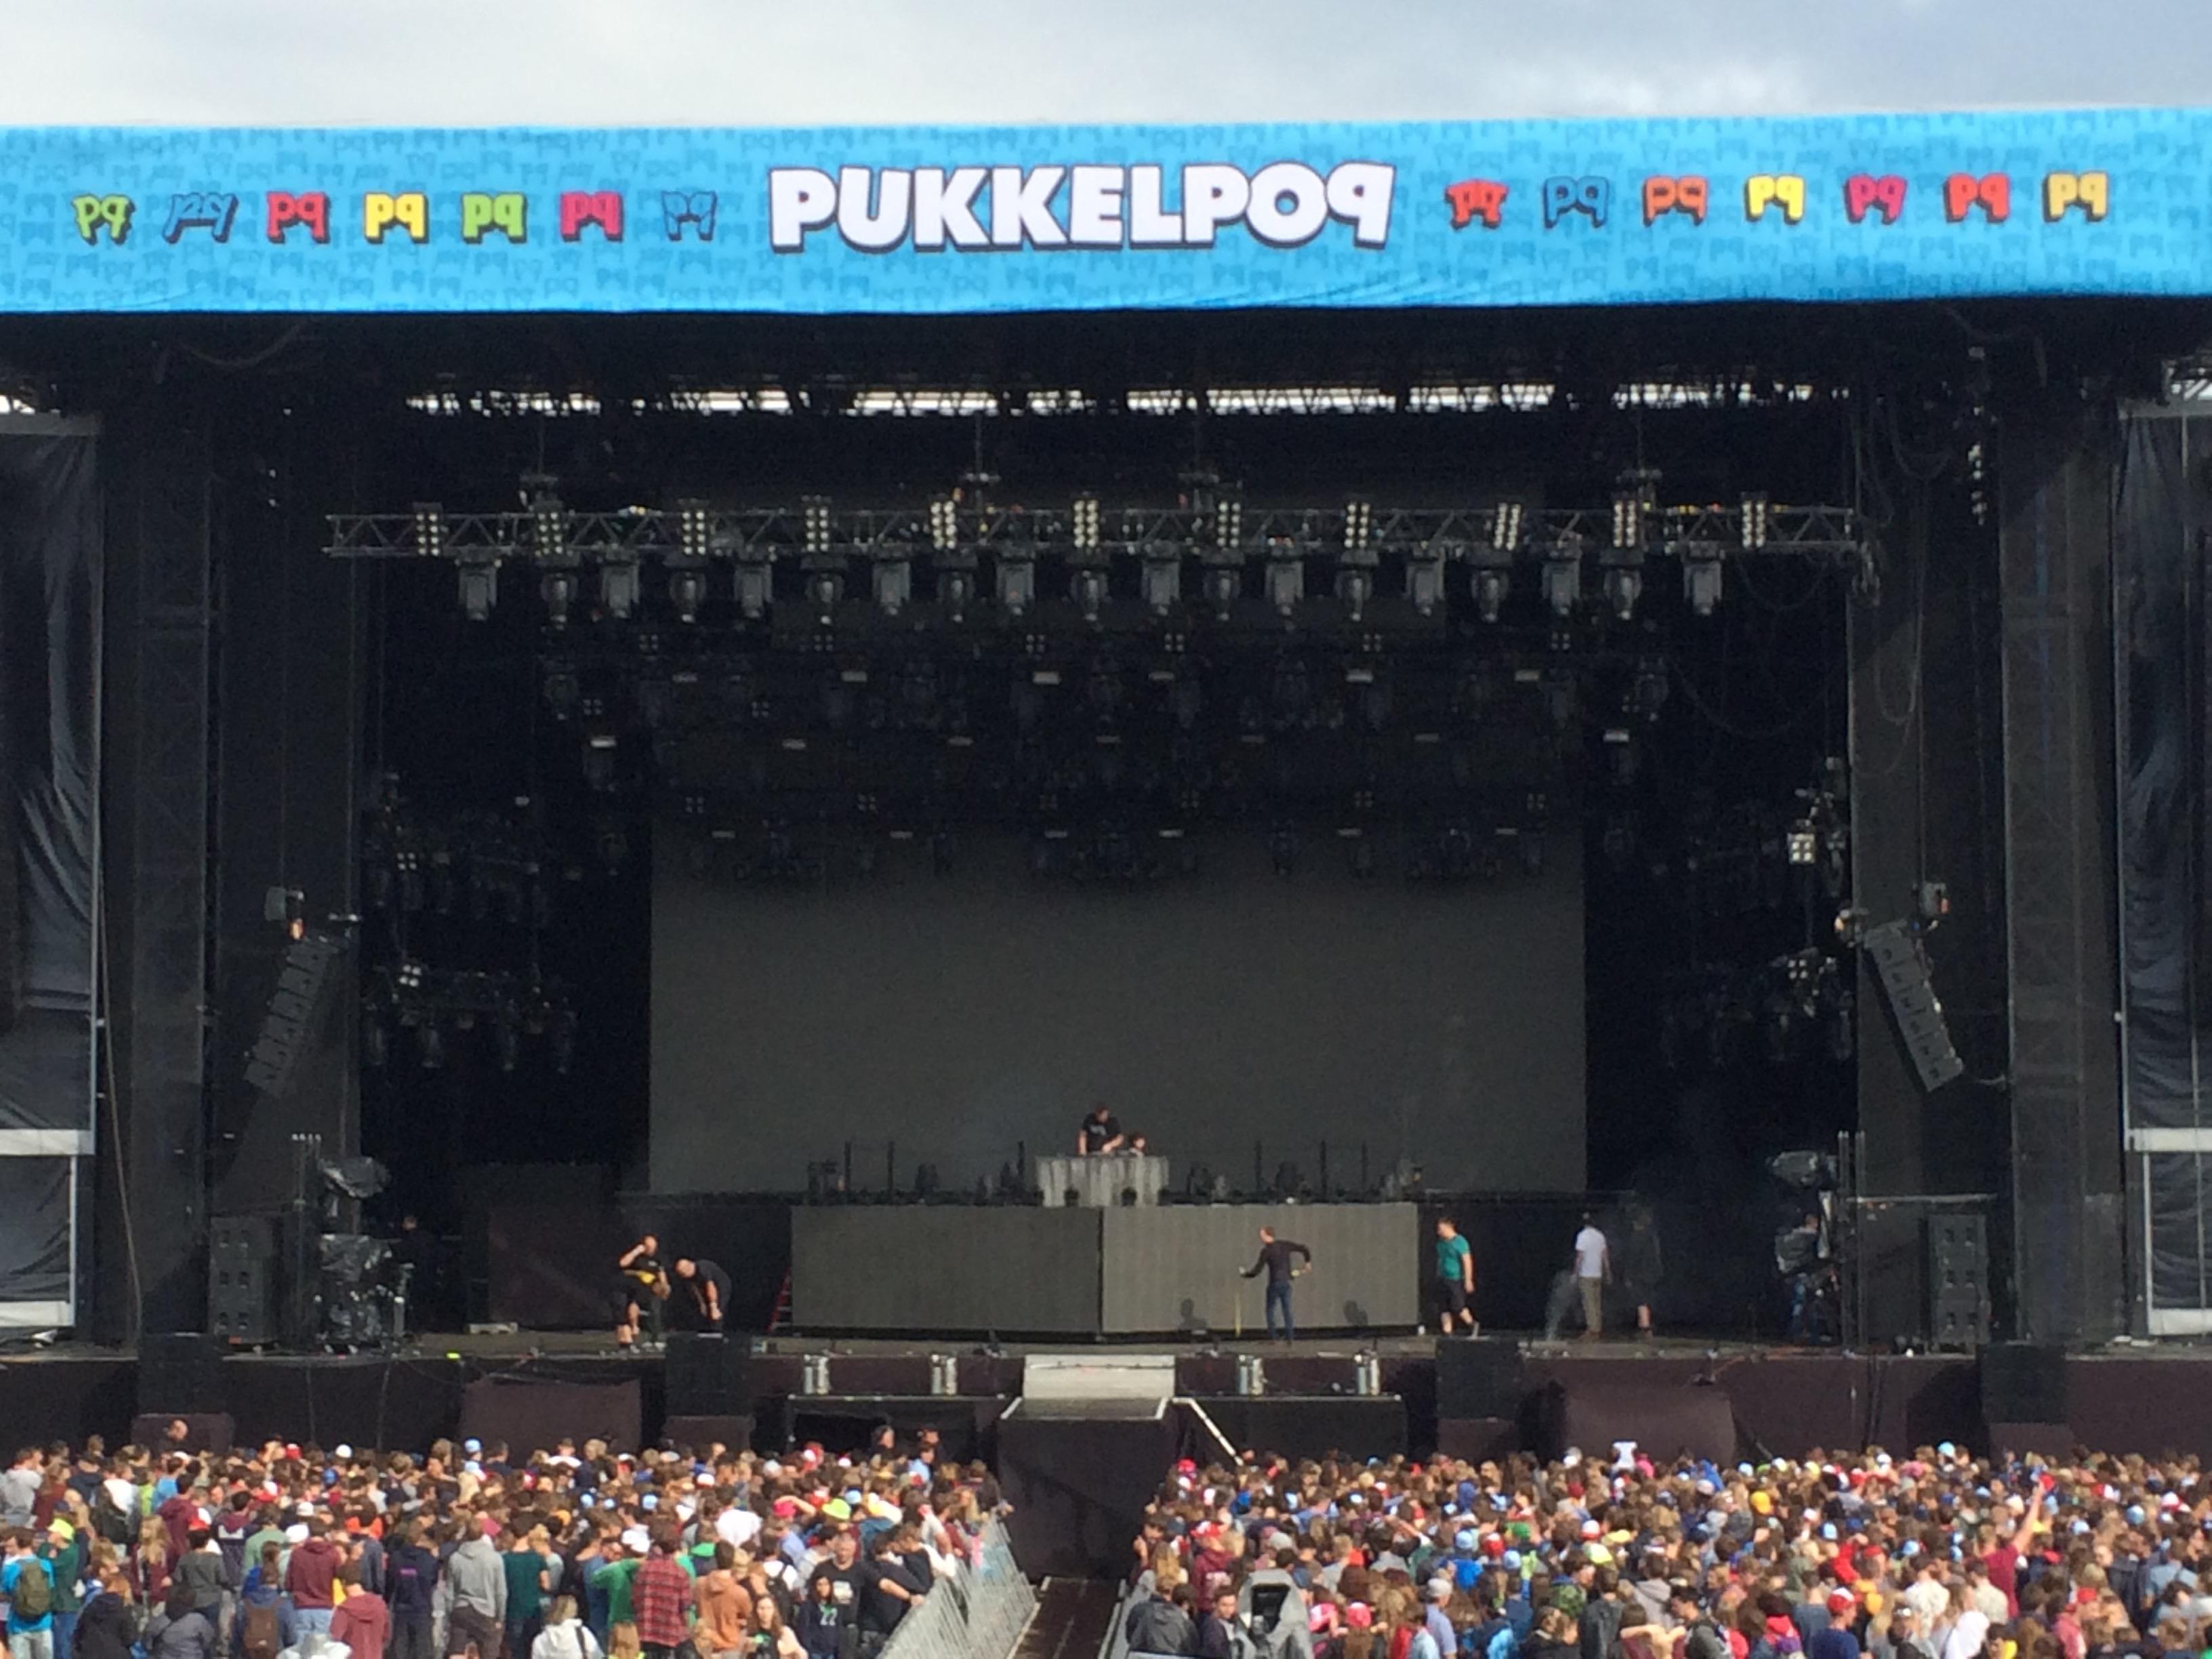 Pukkelpop 2001->2015